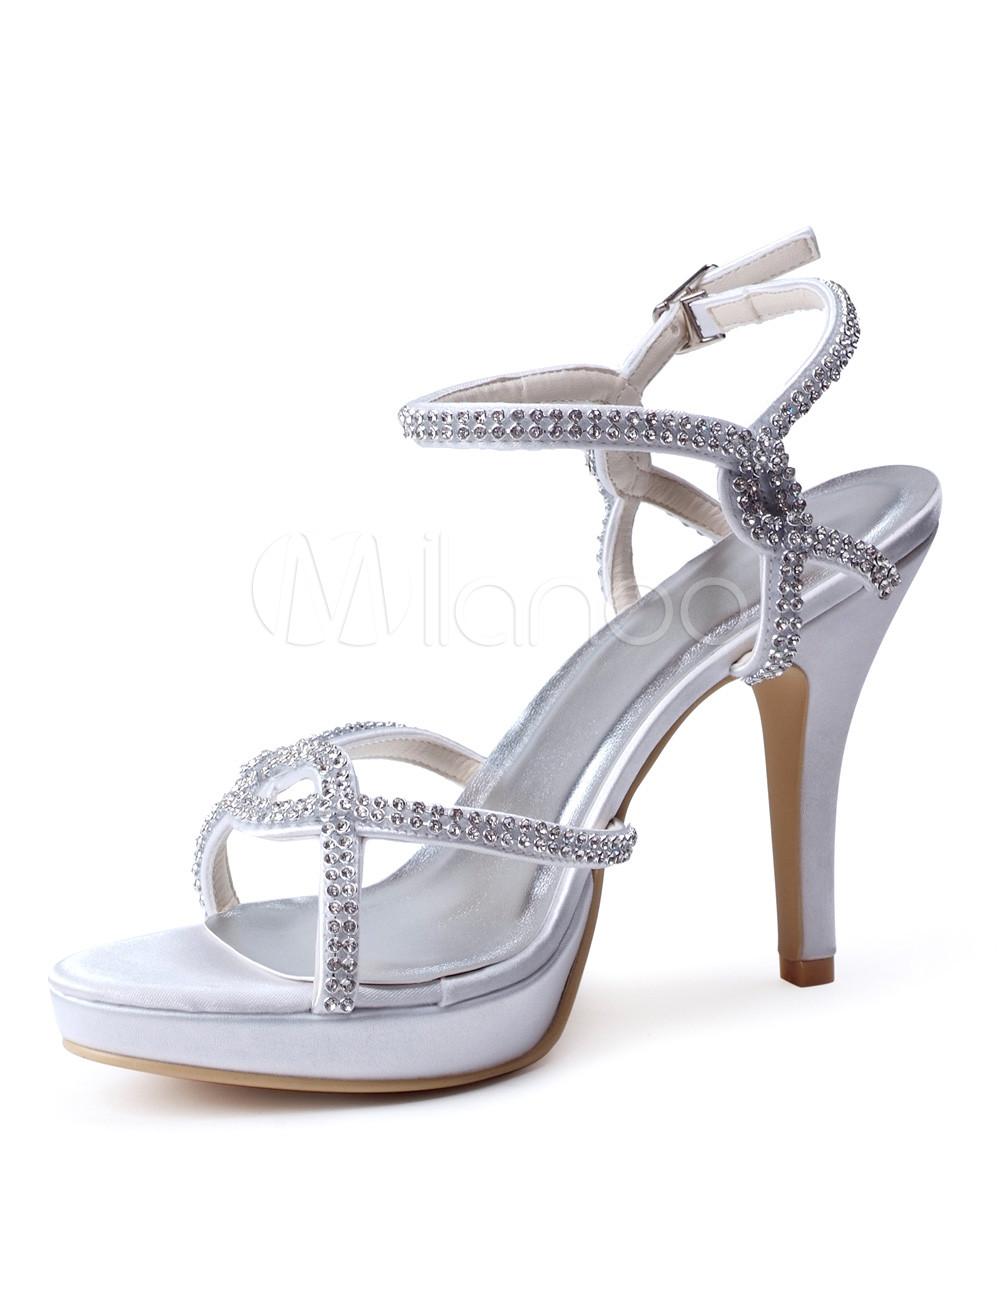 Sexy Ecru White Rhinestone Stiletto Heel Silk And Satin Dress Sandals (Shoes Wedding Shoes) photo